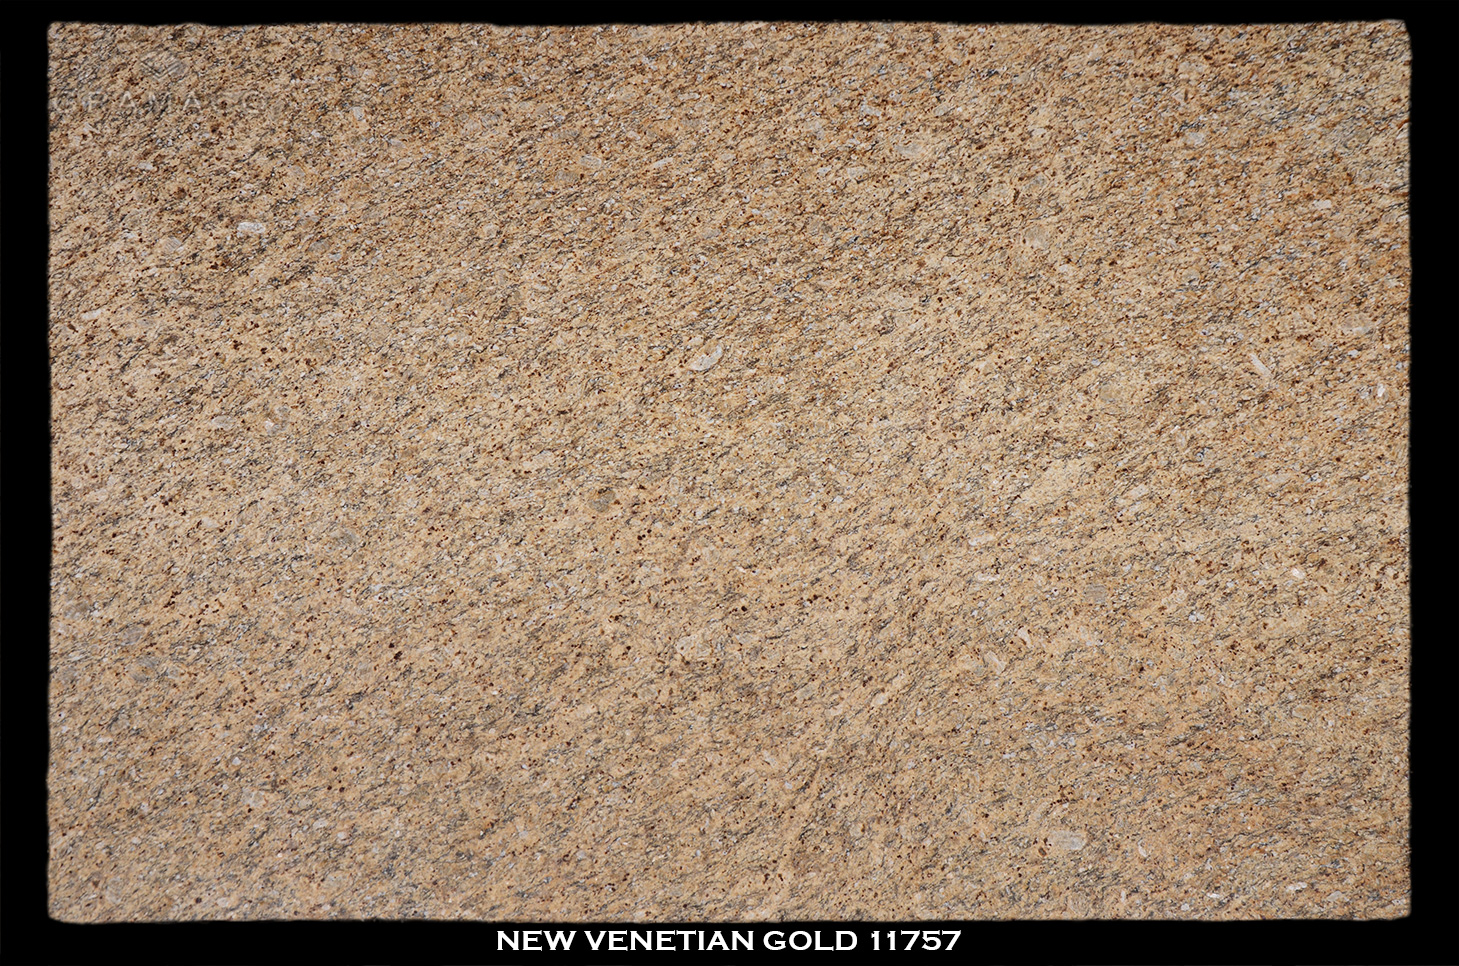 NEW-VENETIAN-GOLD-11757